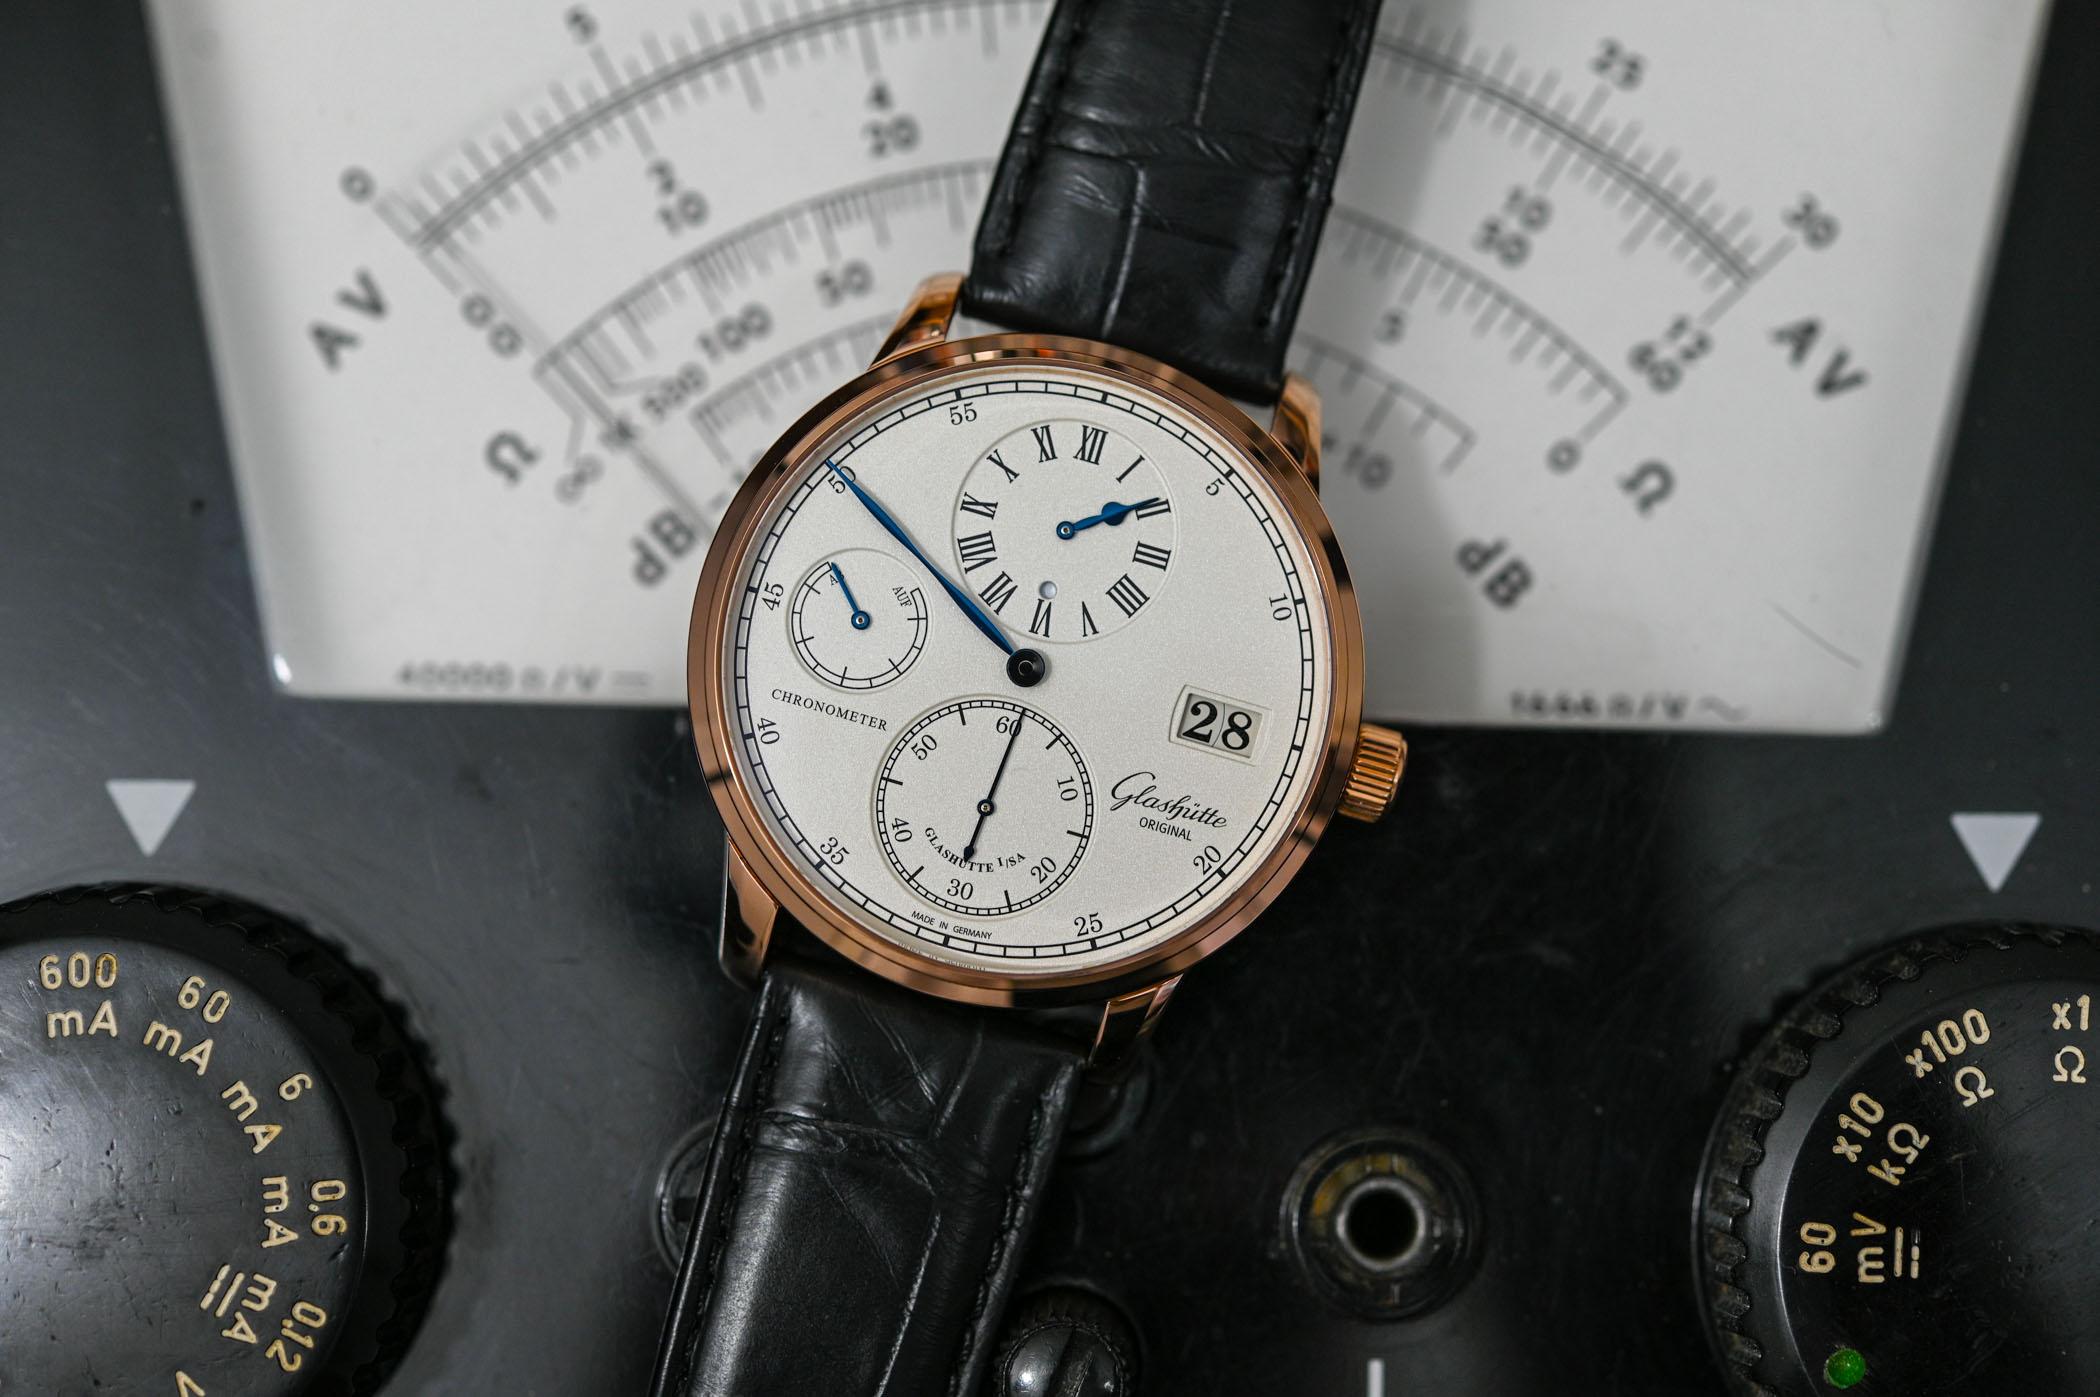 Glashutte Original Senator Chronometer Regulator